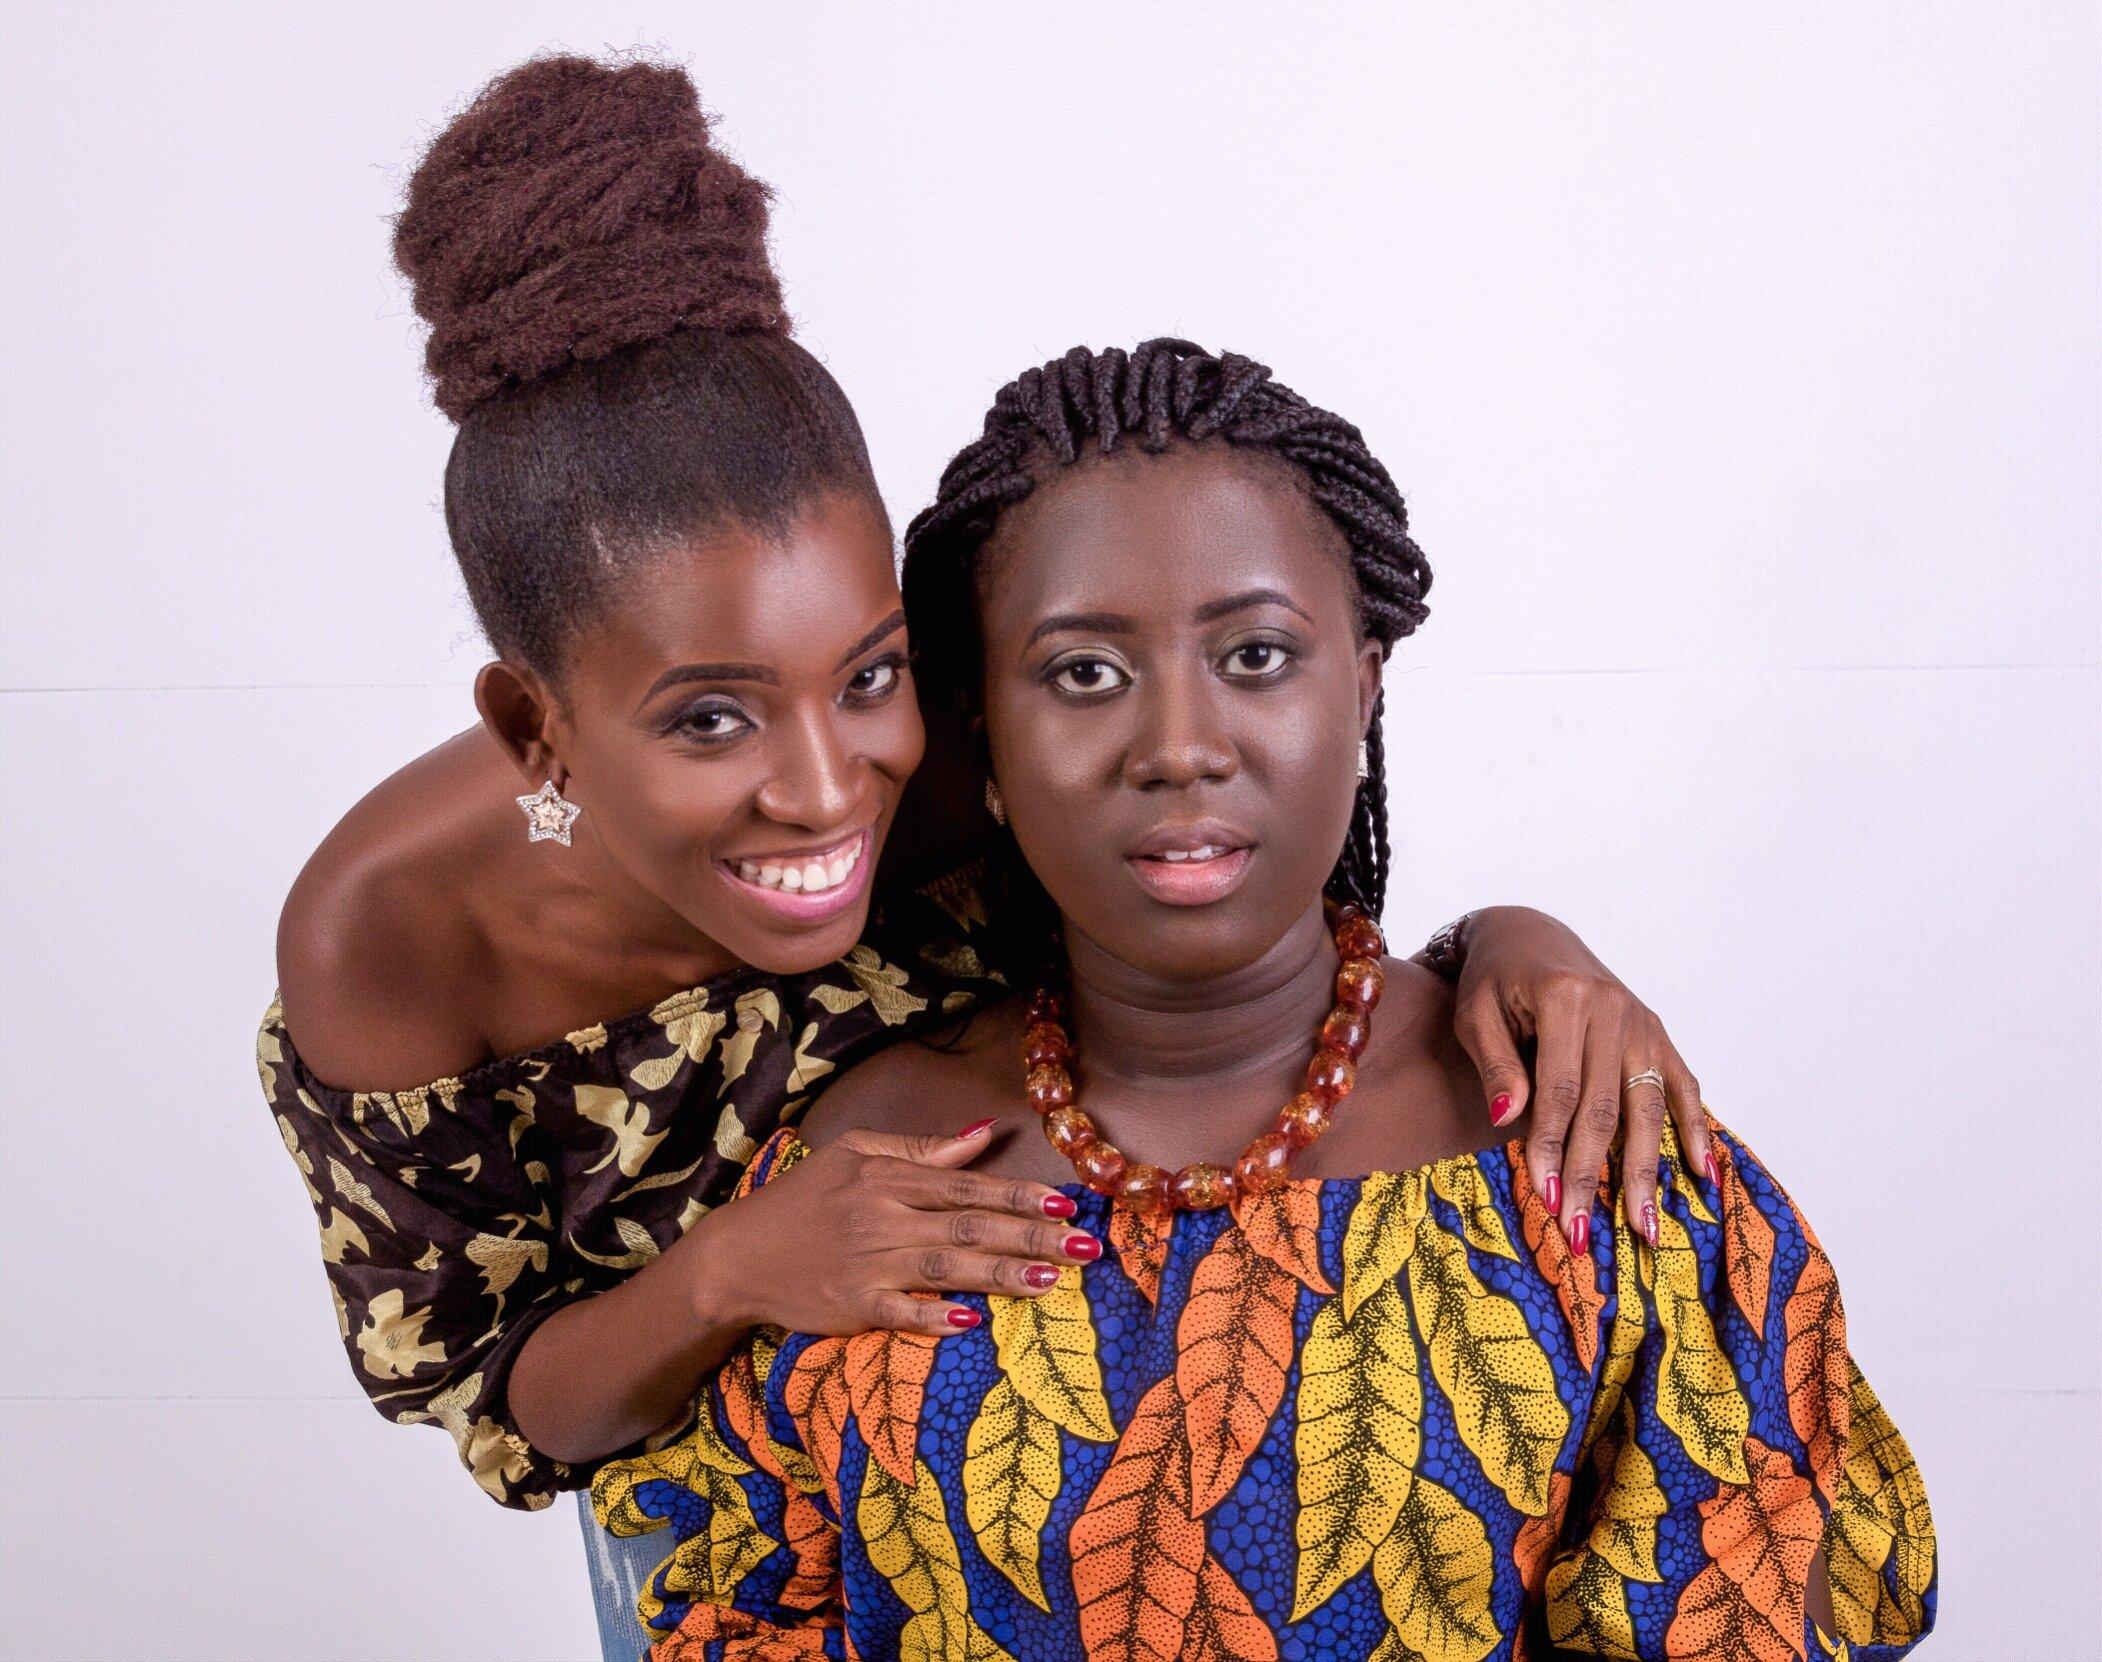 Nana Yaa Ohenewaa Kuffour - Autism 5